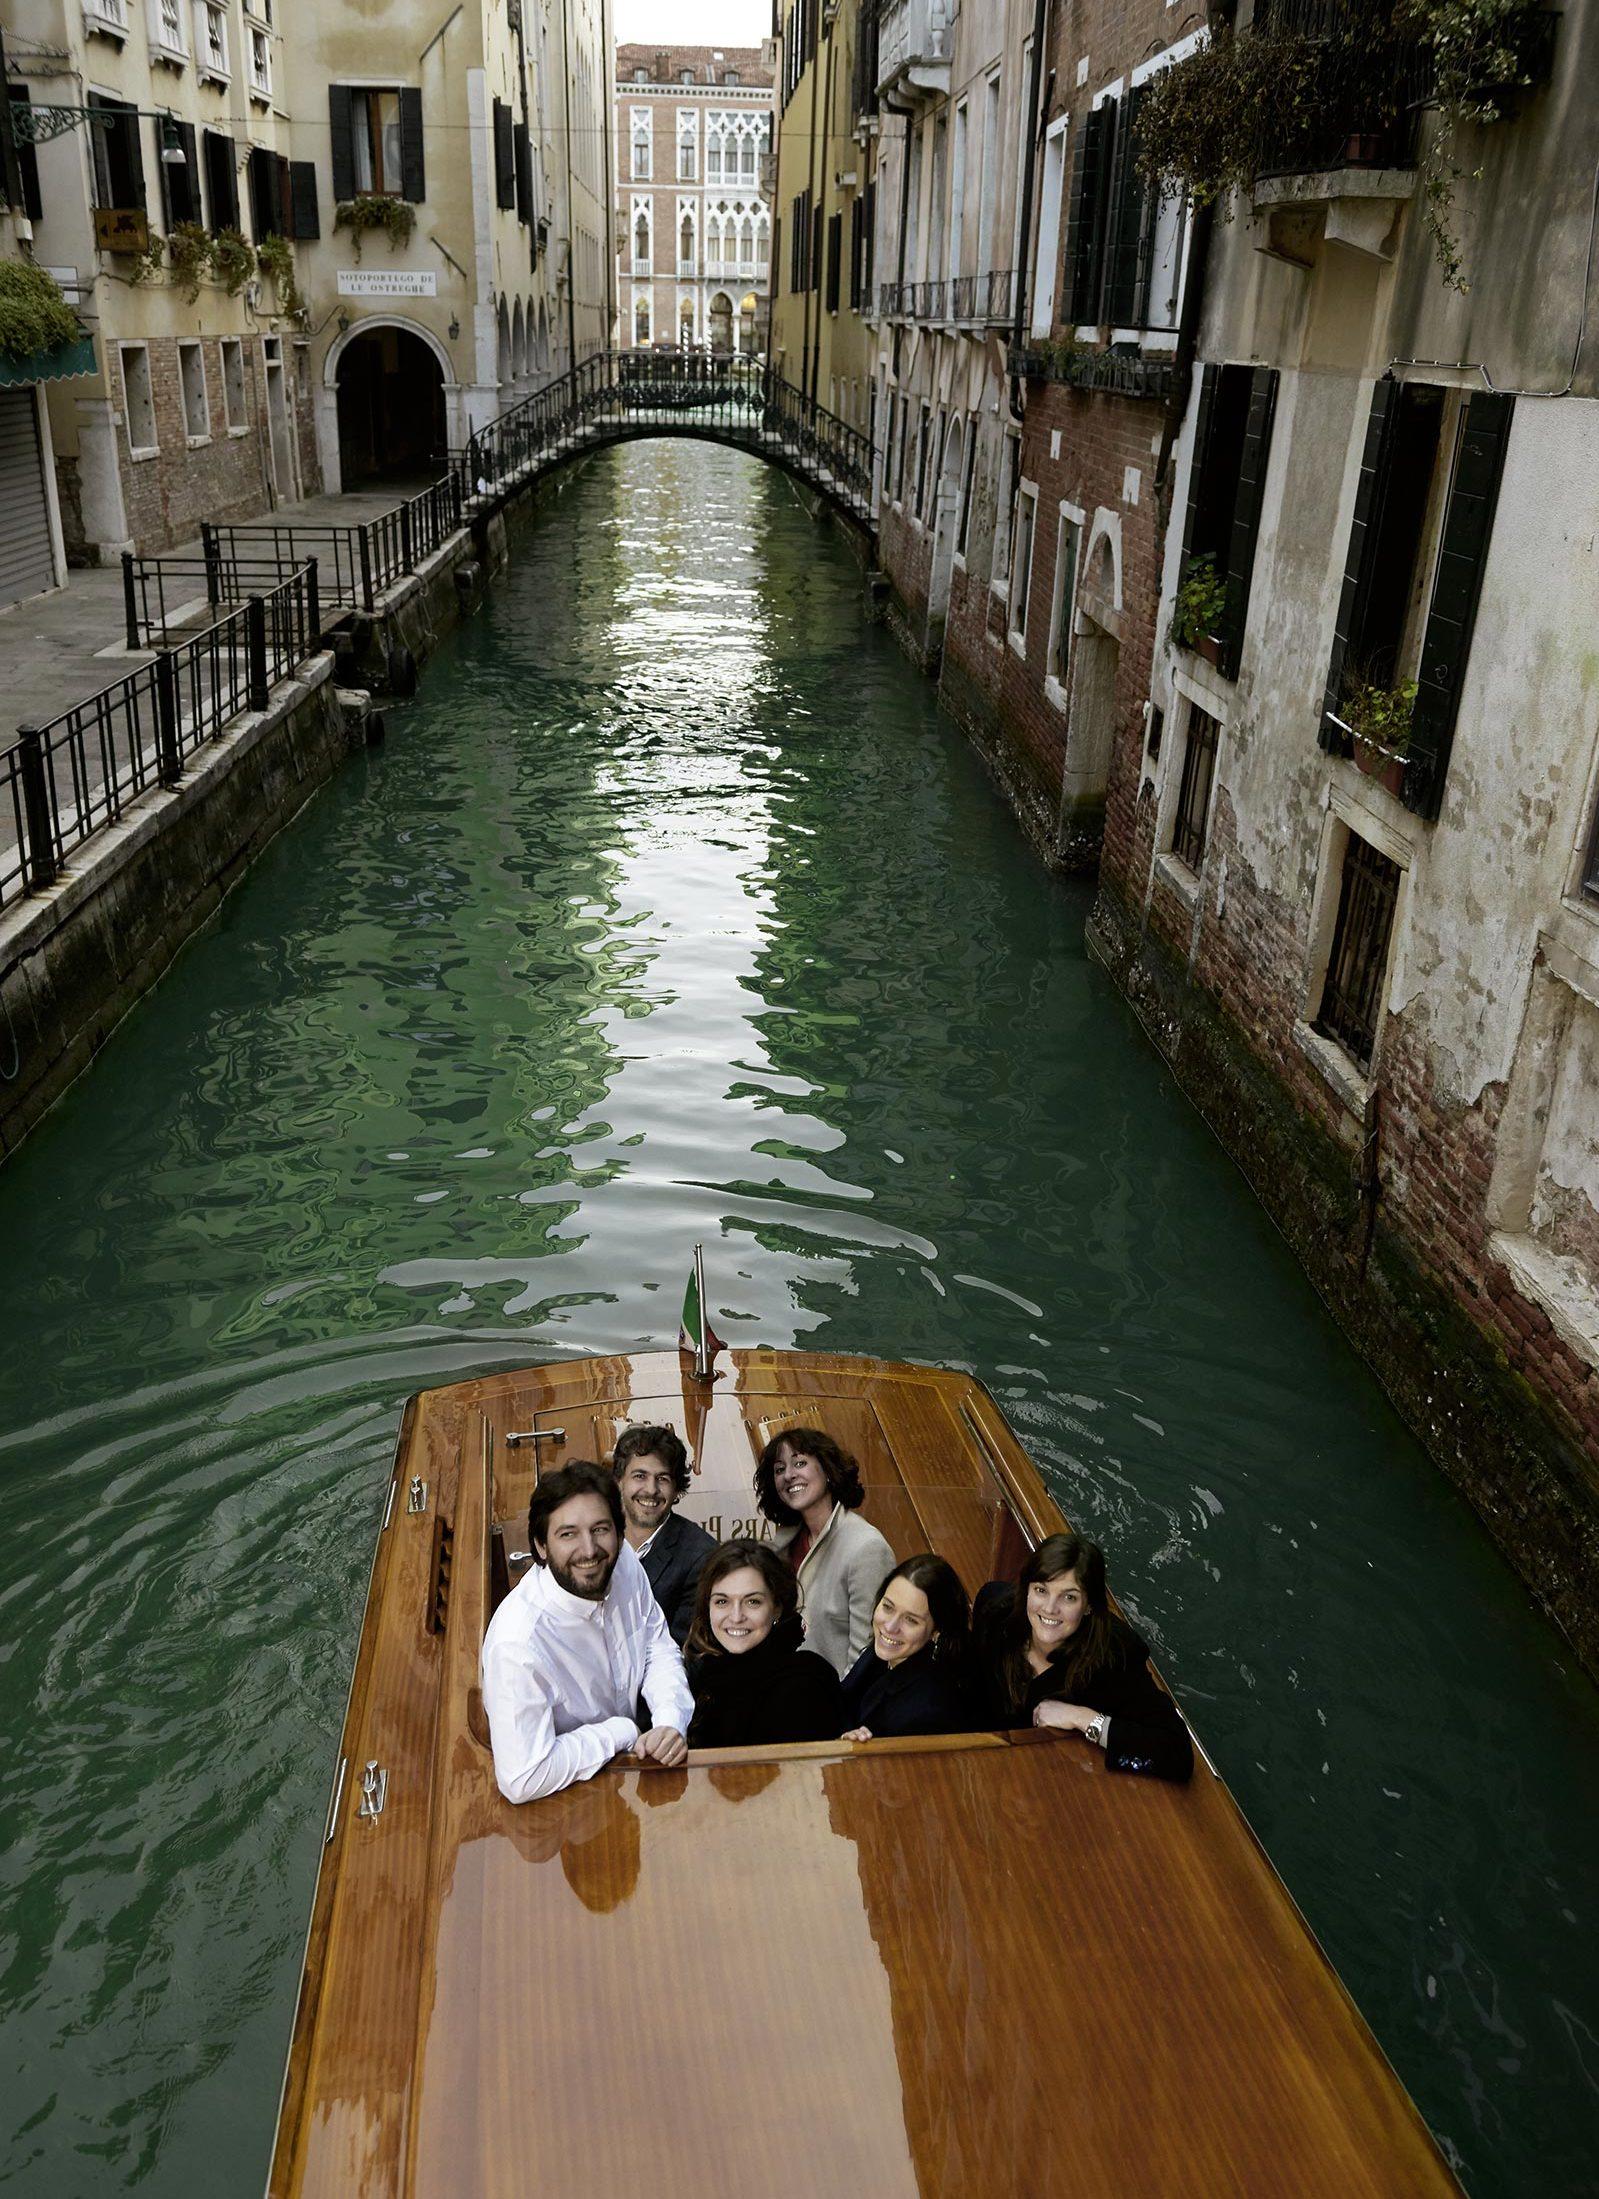 Water taxi check in casa flora venice - Casa flora venezia ...